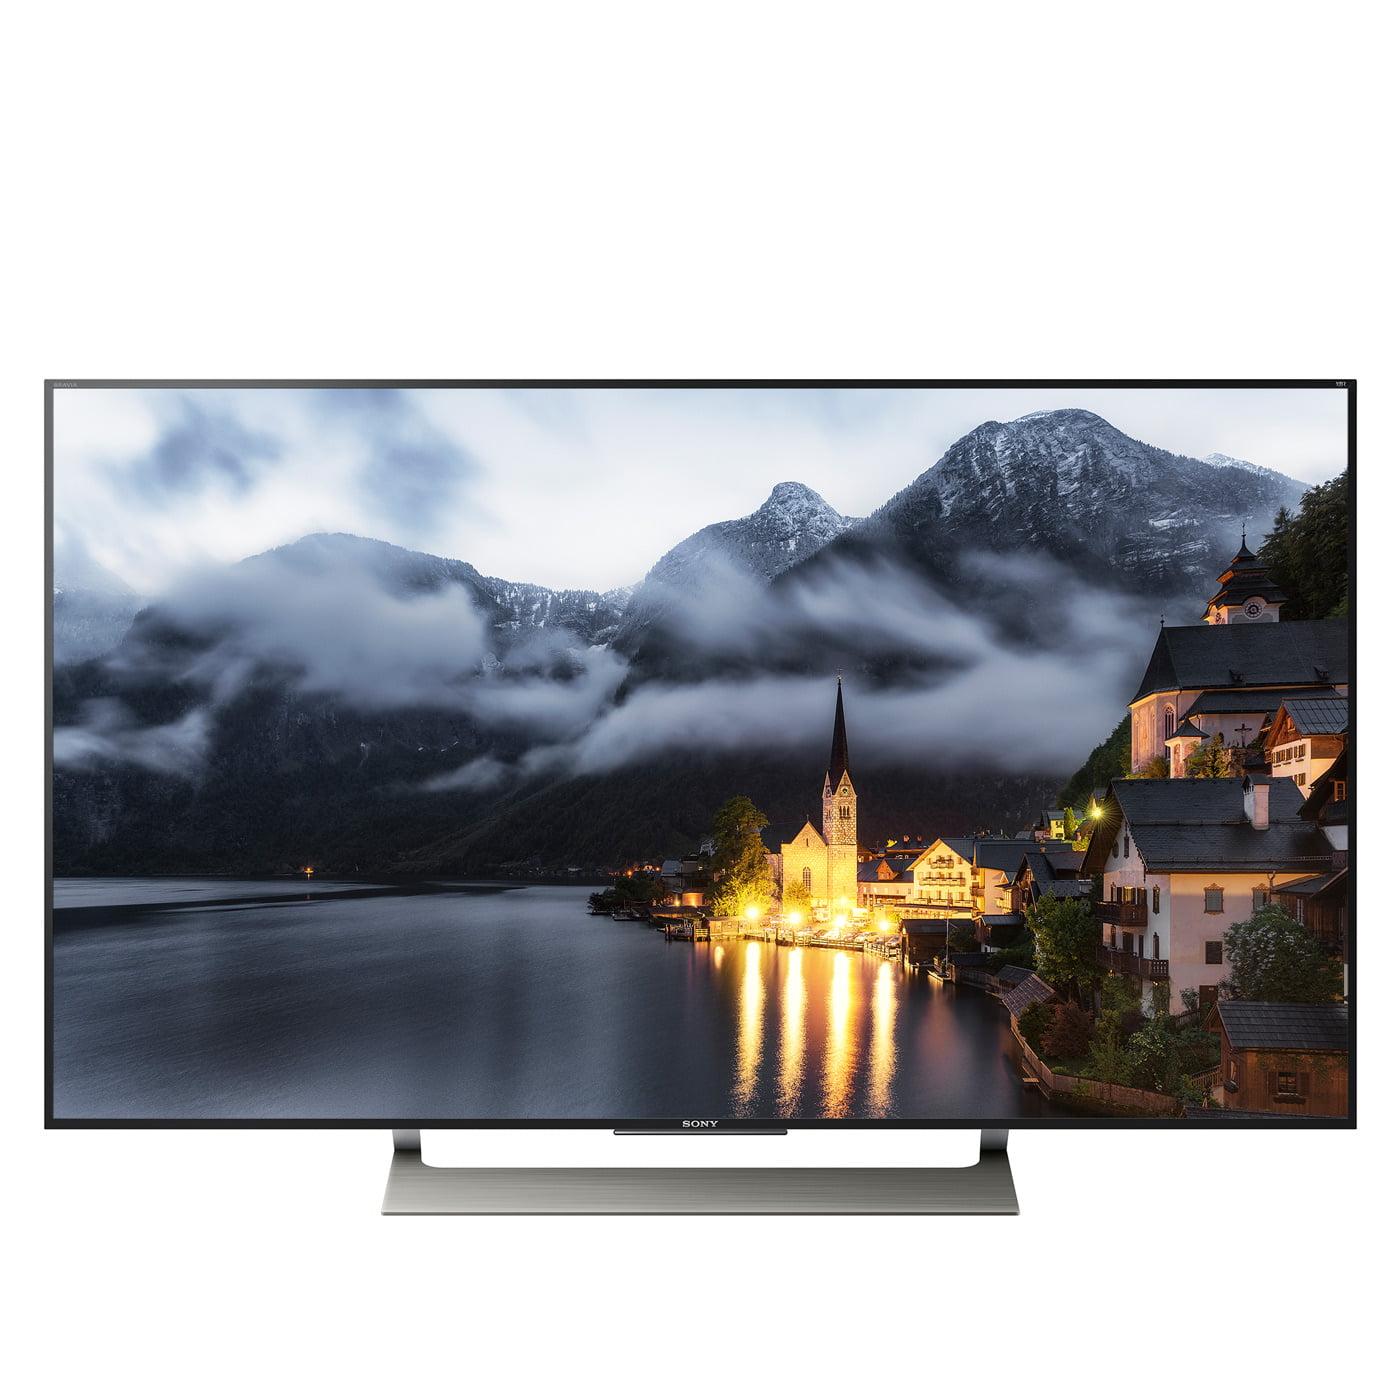 "Sony 55"" Class 4K(2160P) Smart LED TV (XBR55X900E) by Sony"